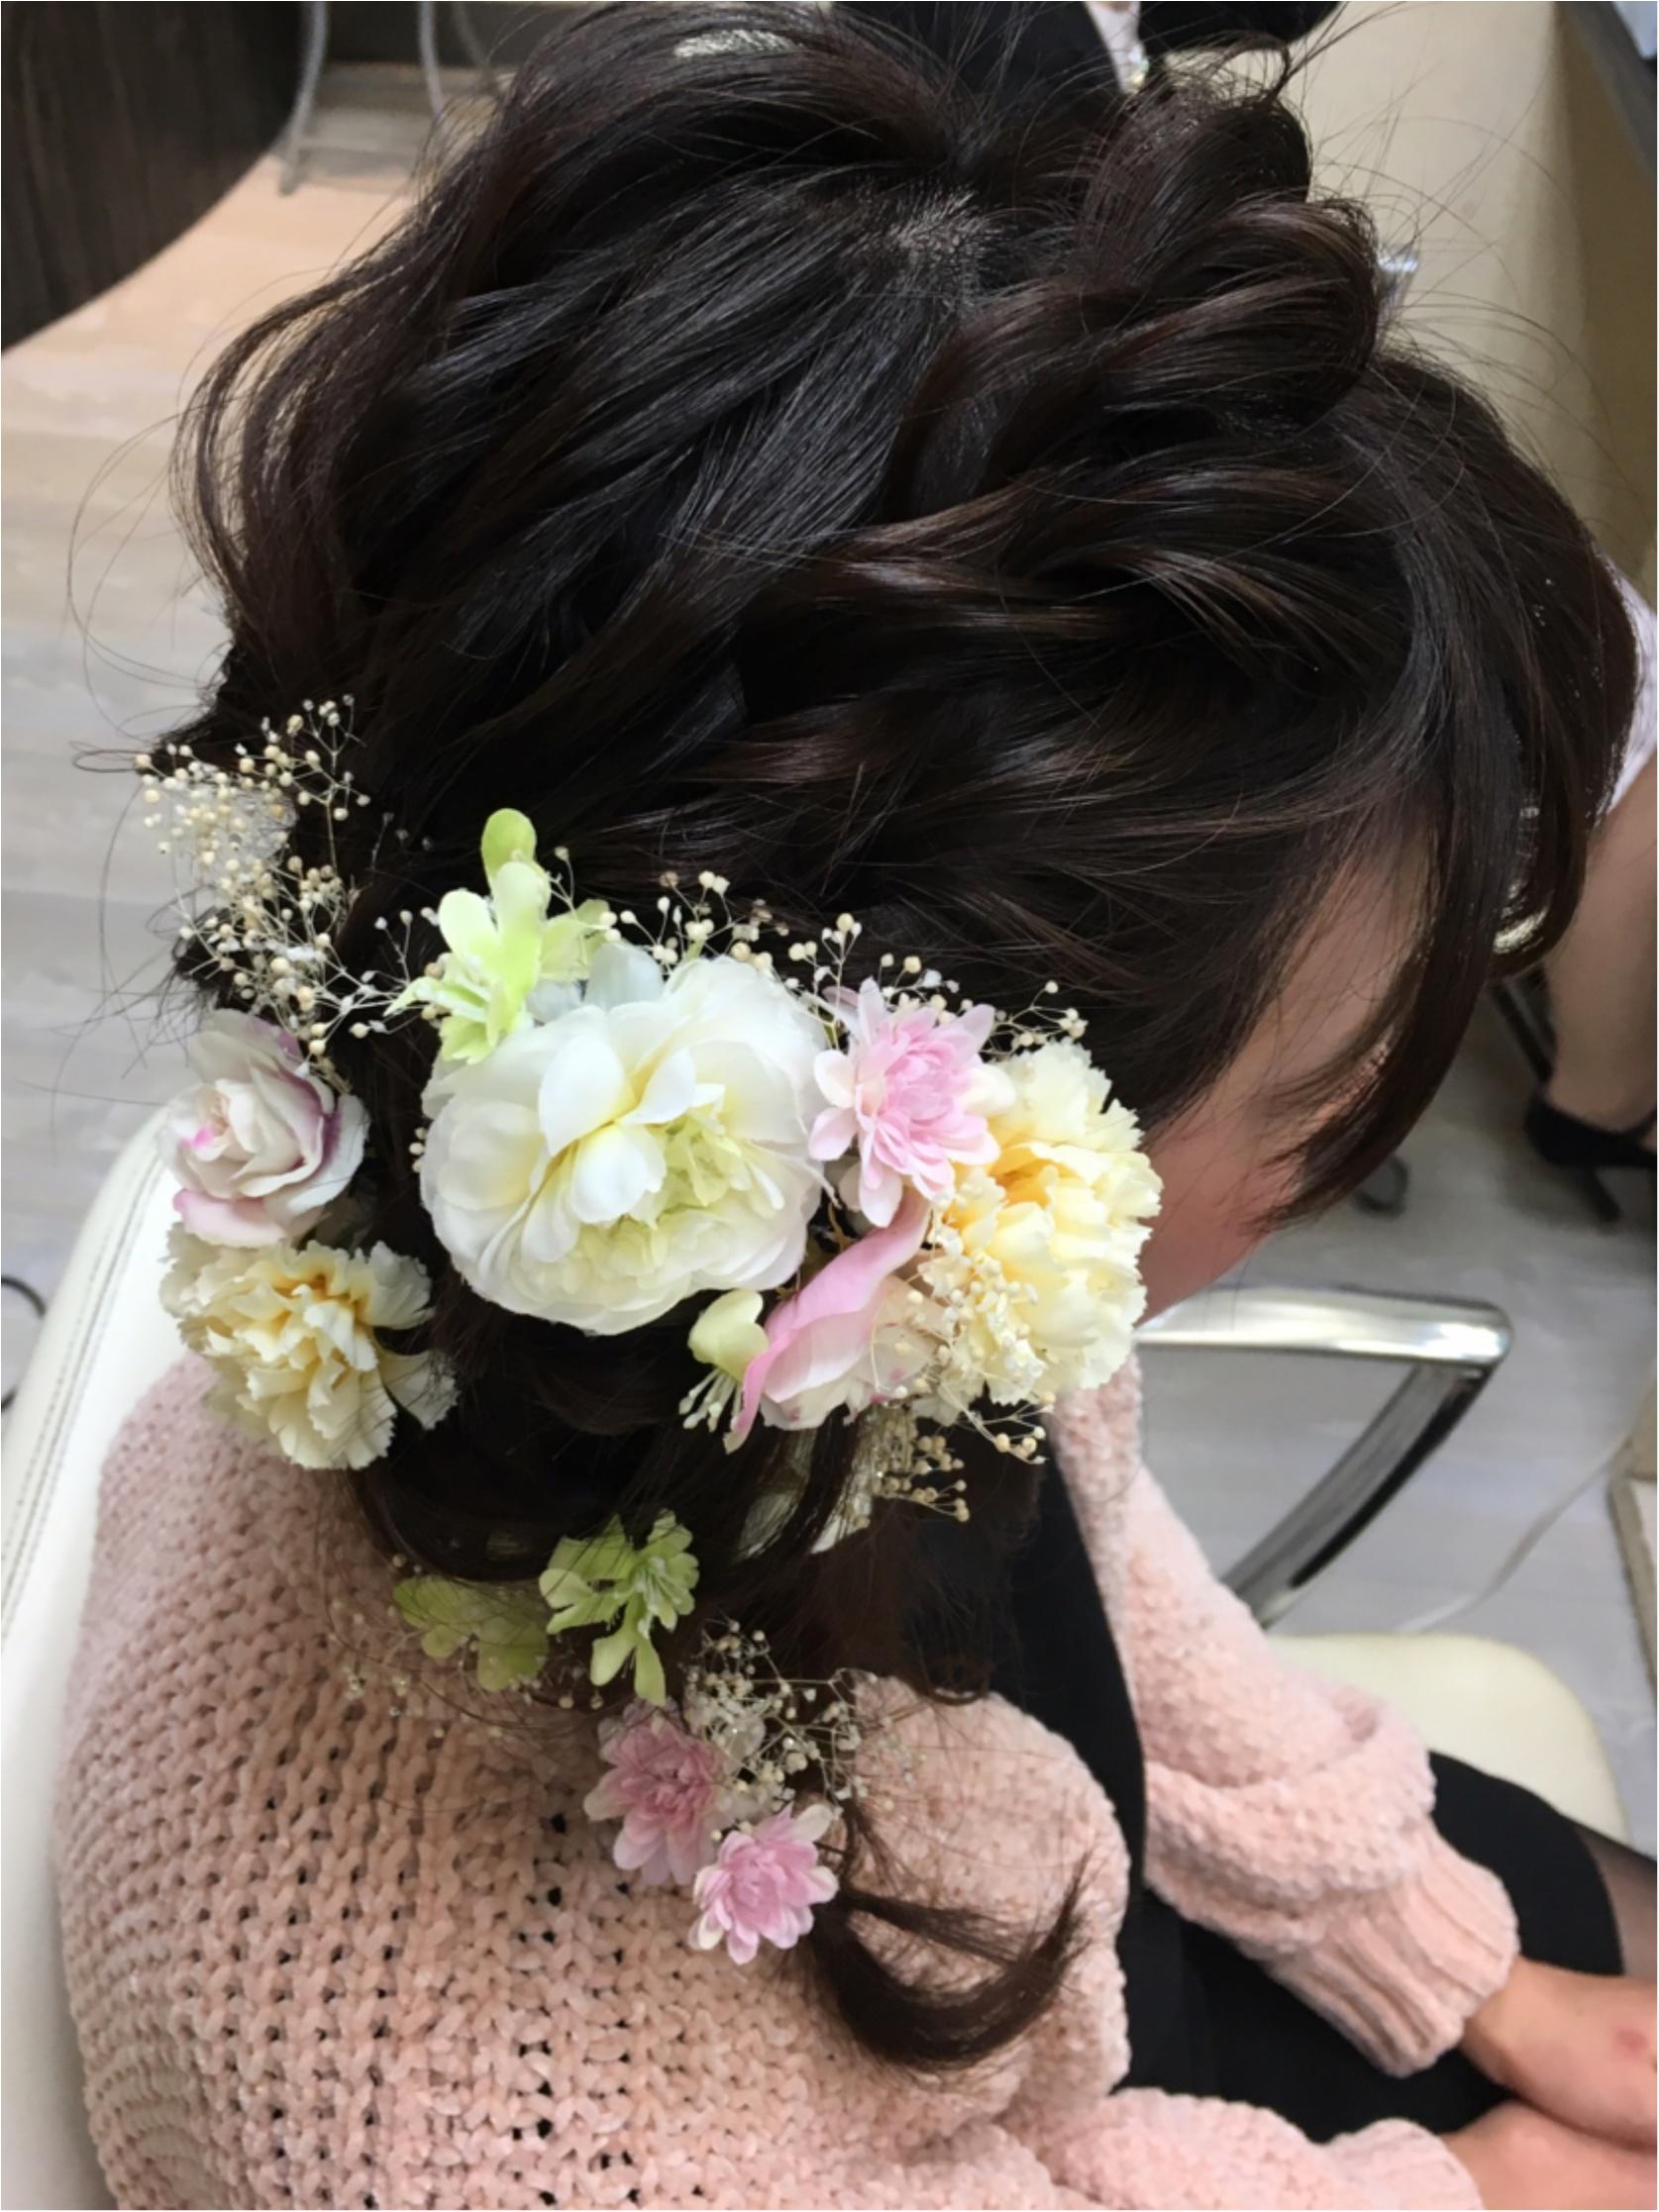 【MORE大女子会2018】当日のほめられファッション&フラワーヘアアレンジ_4